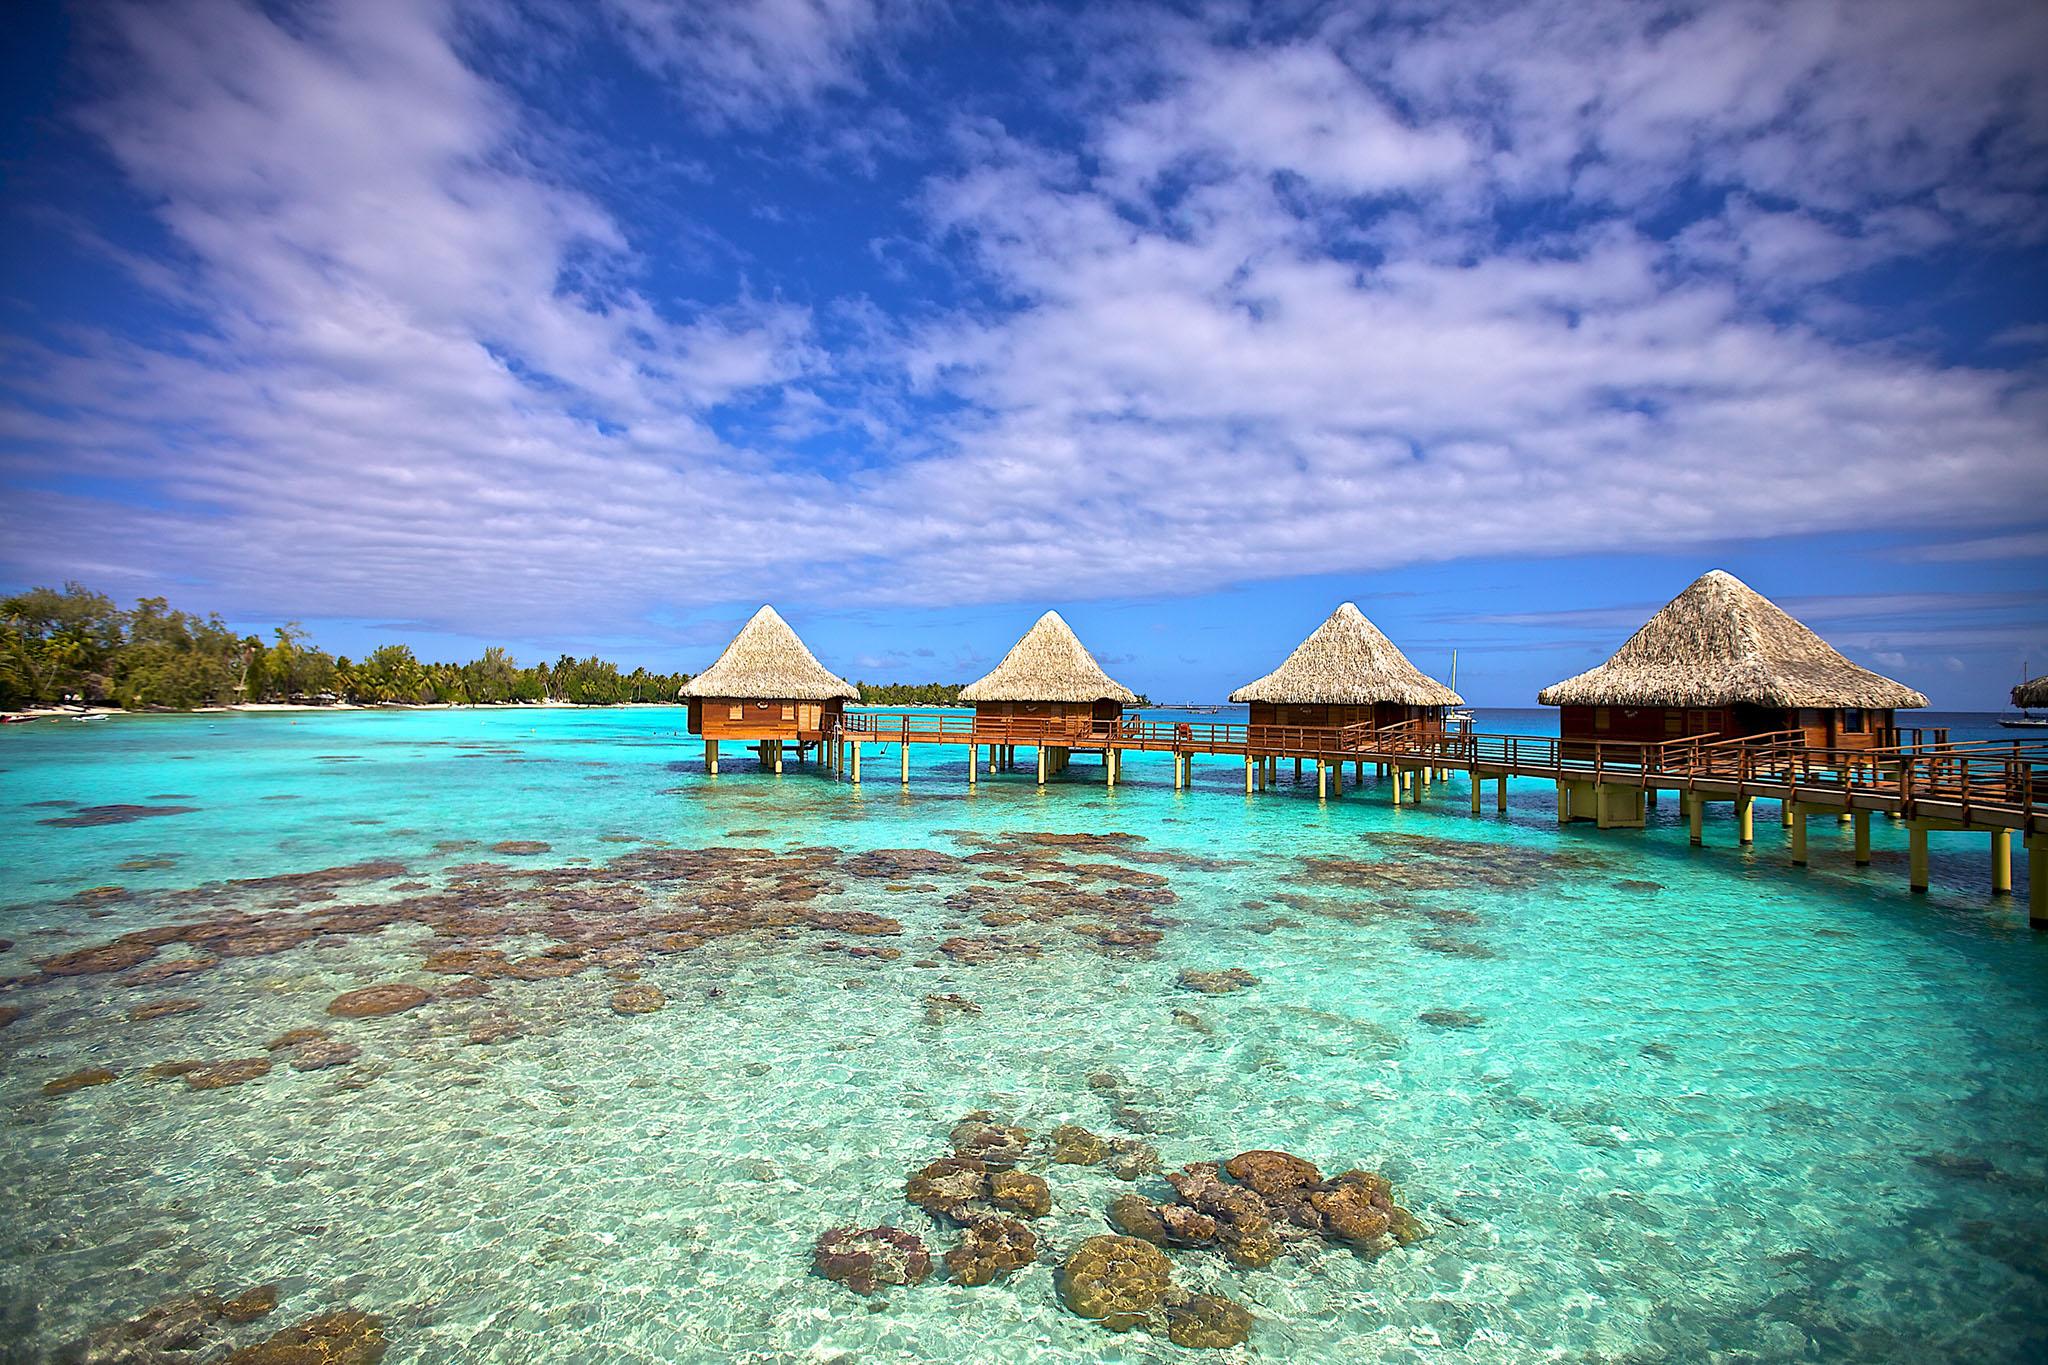 https://tahititourisme.ca/wp-content/uploads/2017/08/RGI-Kia-Ora-Overwater-Bungalows-Exterior-20.gallery_image.1.jpg